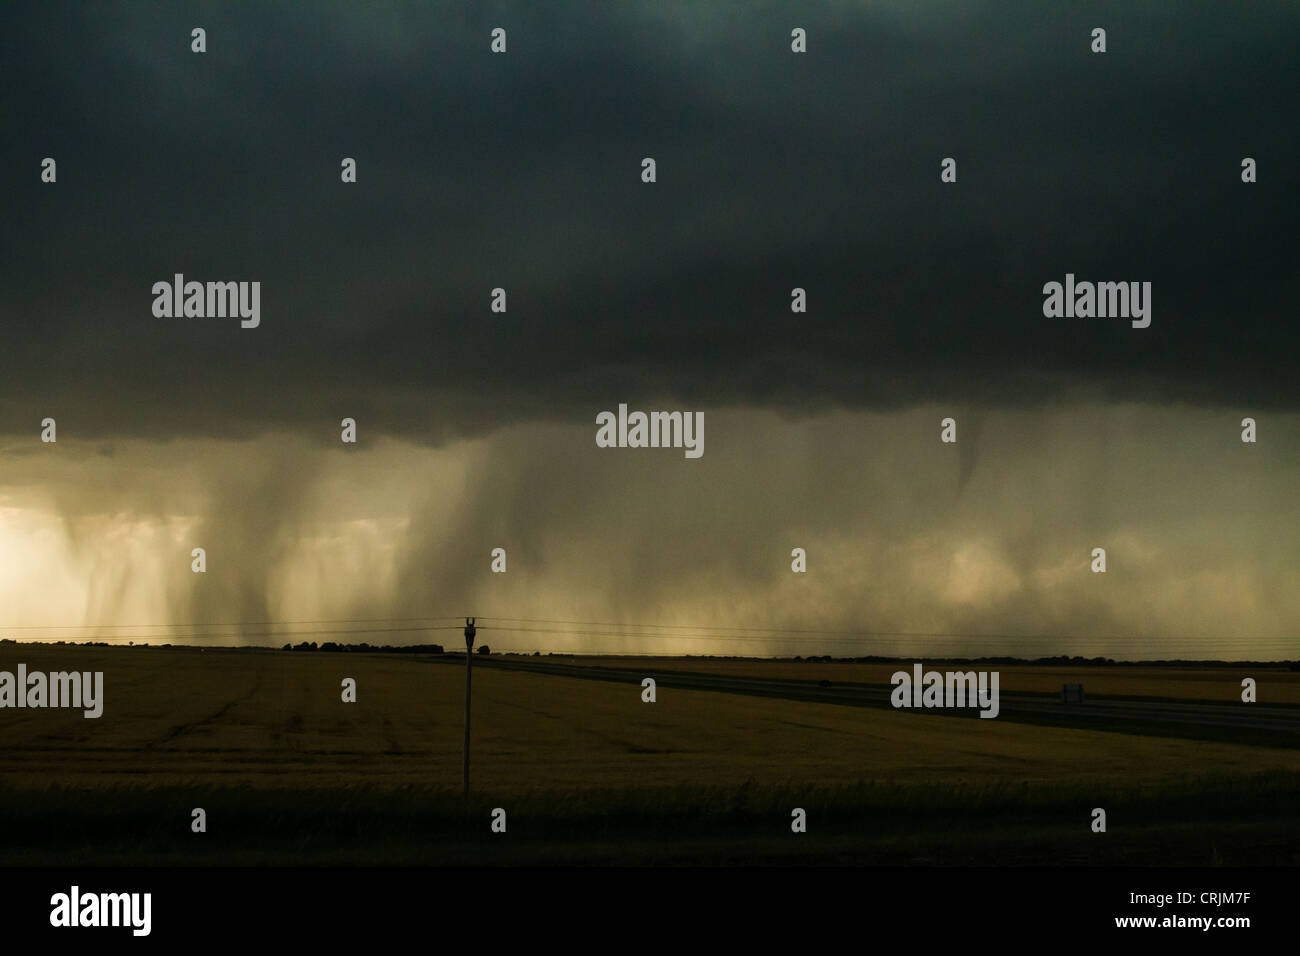 Rain Wrapped Tornado, Kingman Kansas May 19 2012 - Stock Image